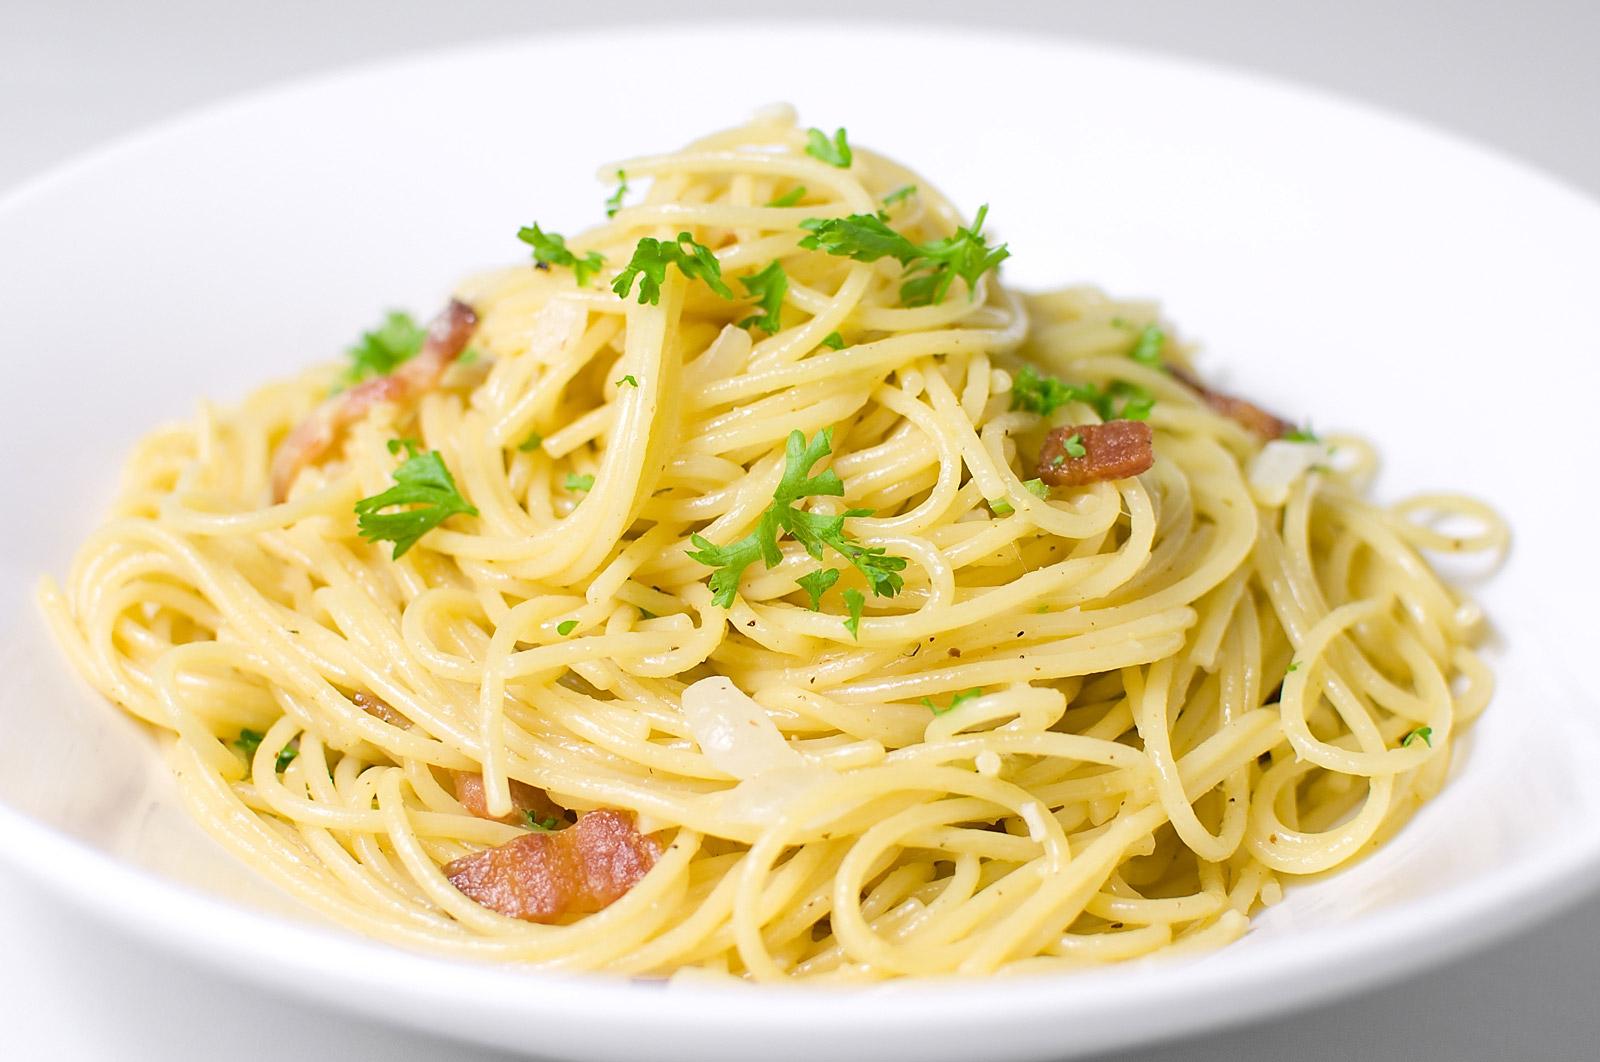 Pasta clipart pasta carbonara. Spaghetti recipes squared